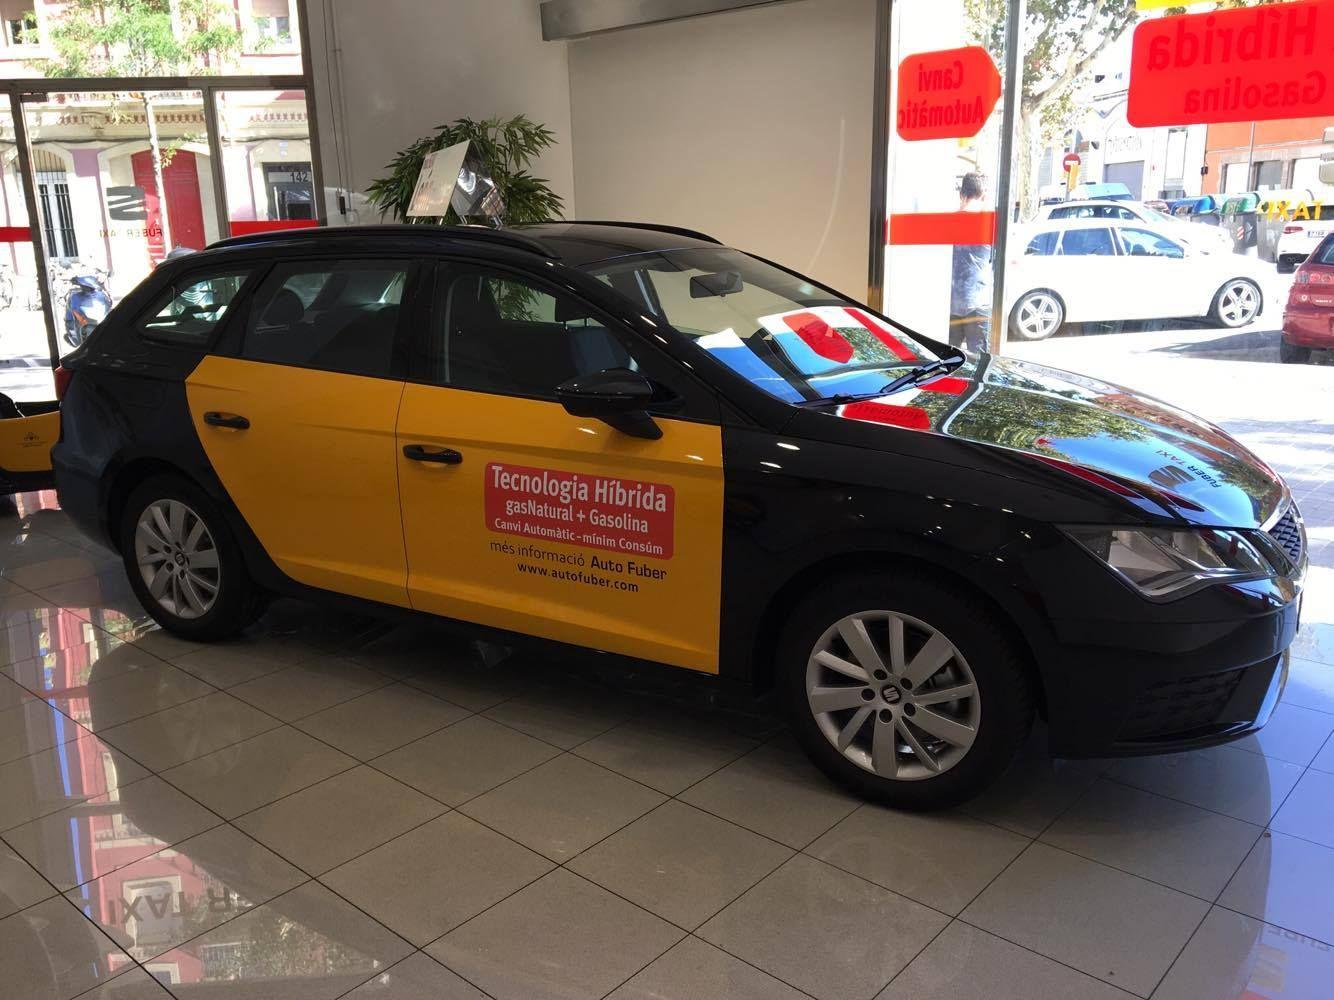 Nuevo Taxi Seat León ST GNC. ¡Resérvalo!